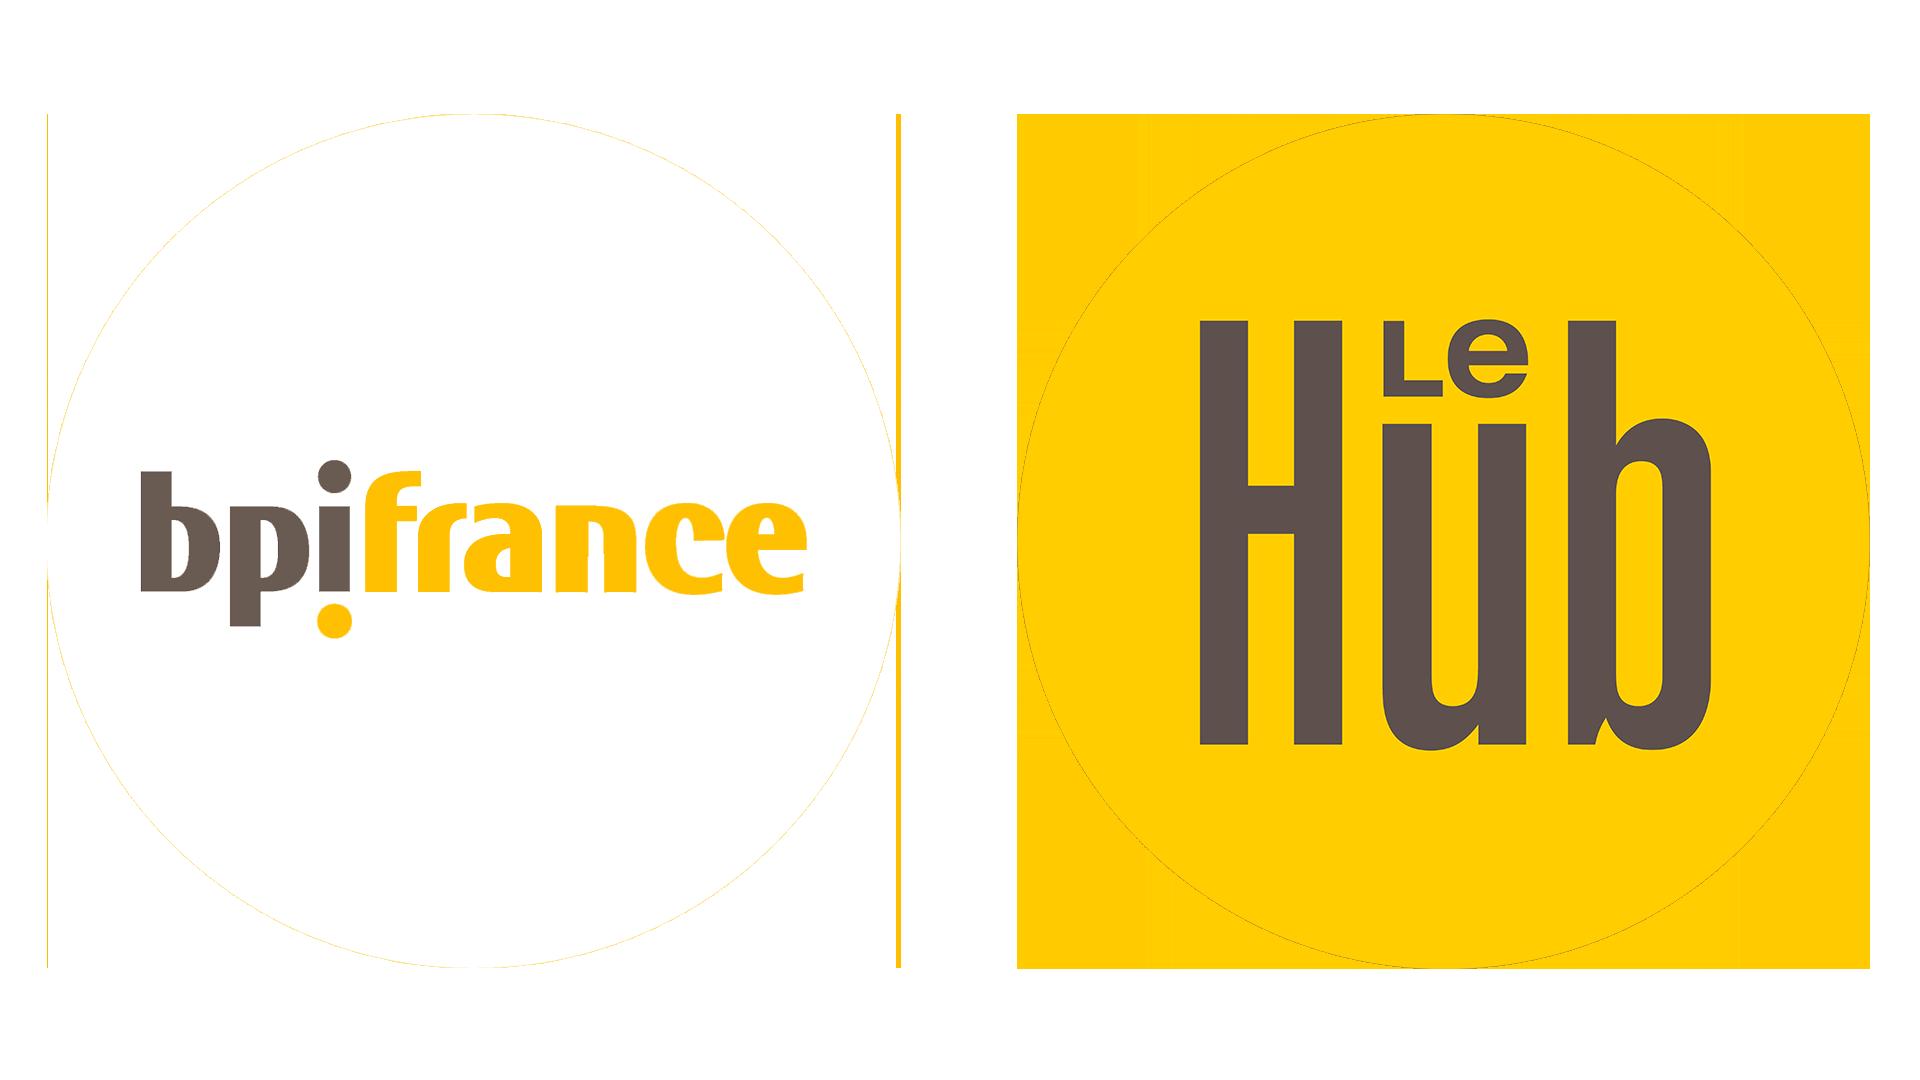 logo-bpifrance-le-hub-white-hd